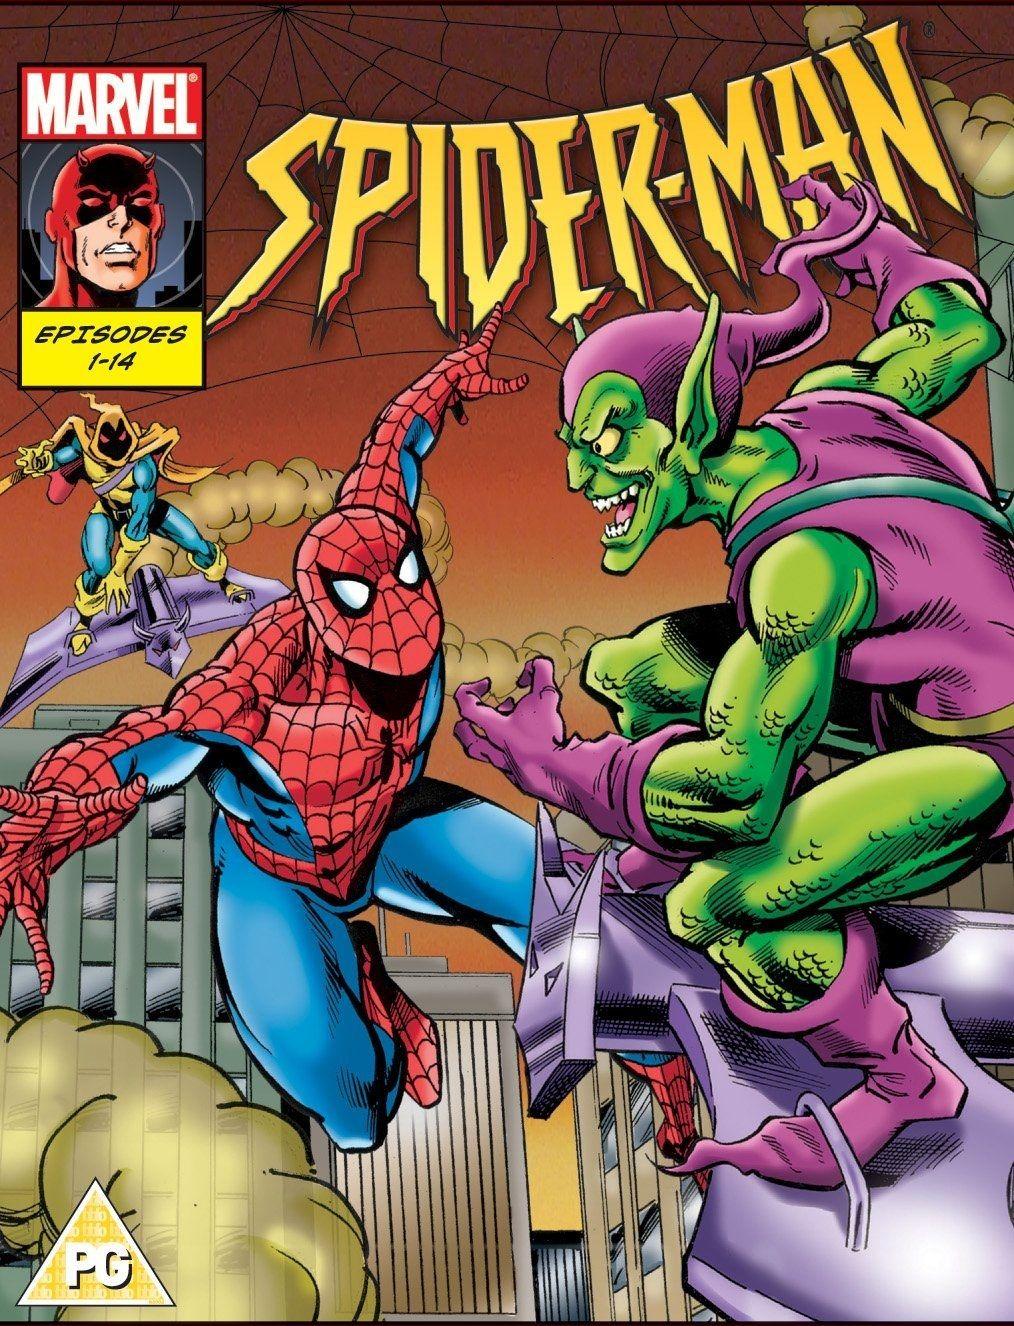 Spider Man Animated Series 1994 Spider Man Animated Series Spiderman Animation Series